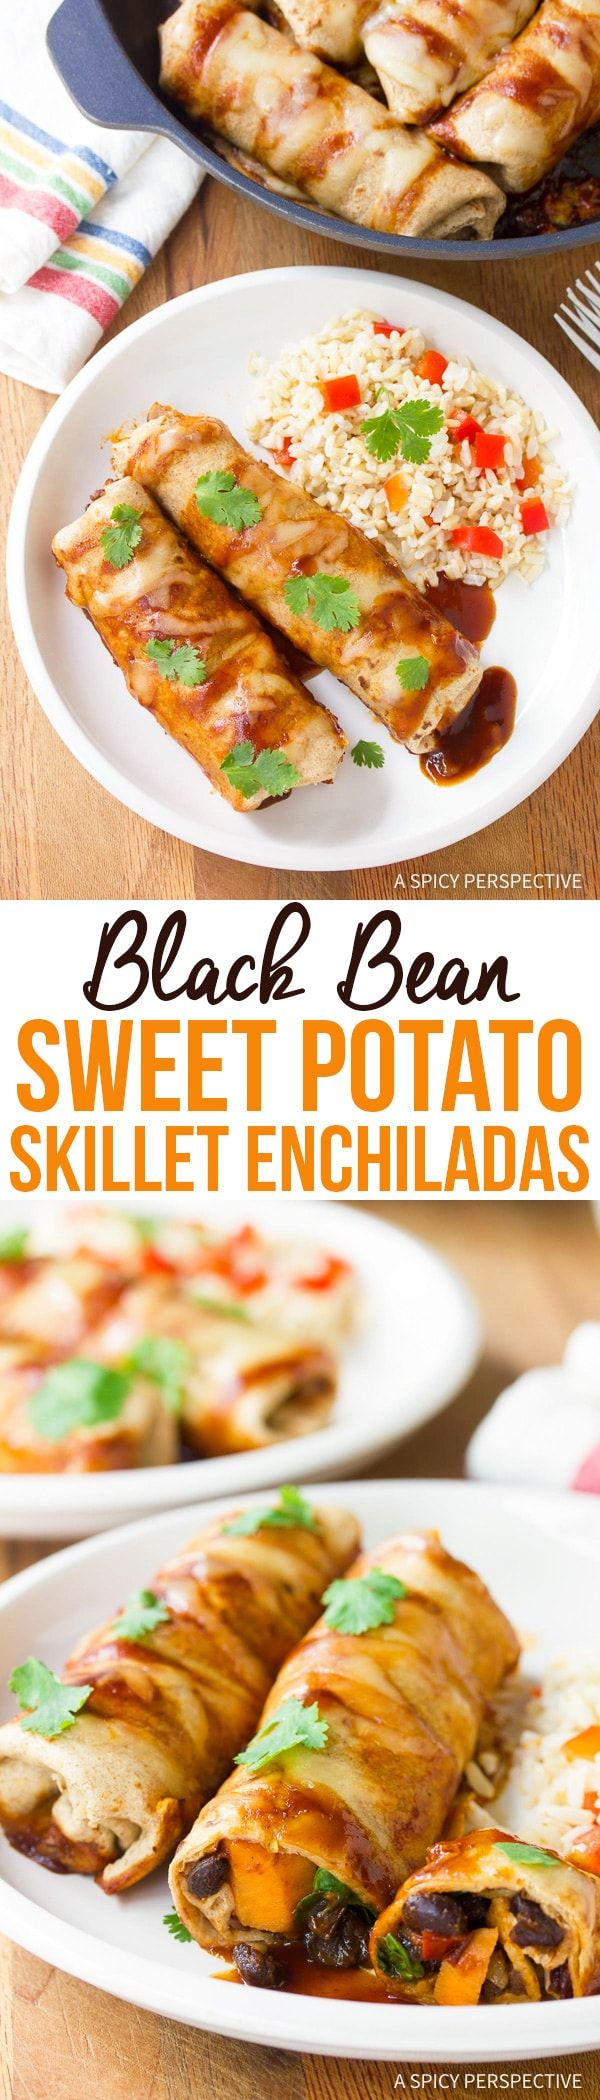 Black Bean Sweet Potato Skillet Enchiladas Recipe - A zesty robust vegetarian meal you can make in one pan!  via @spicyperspectiv